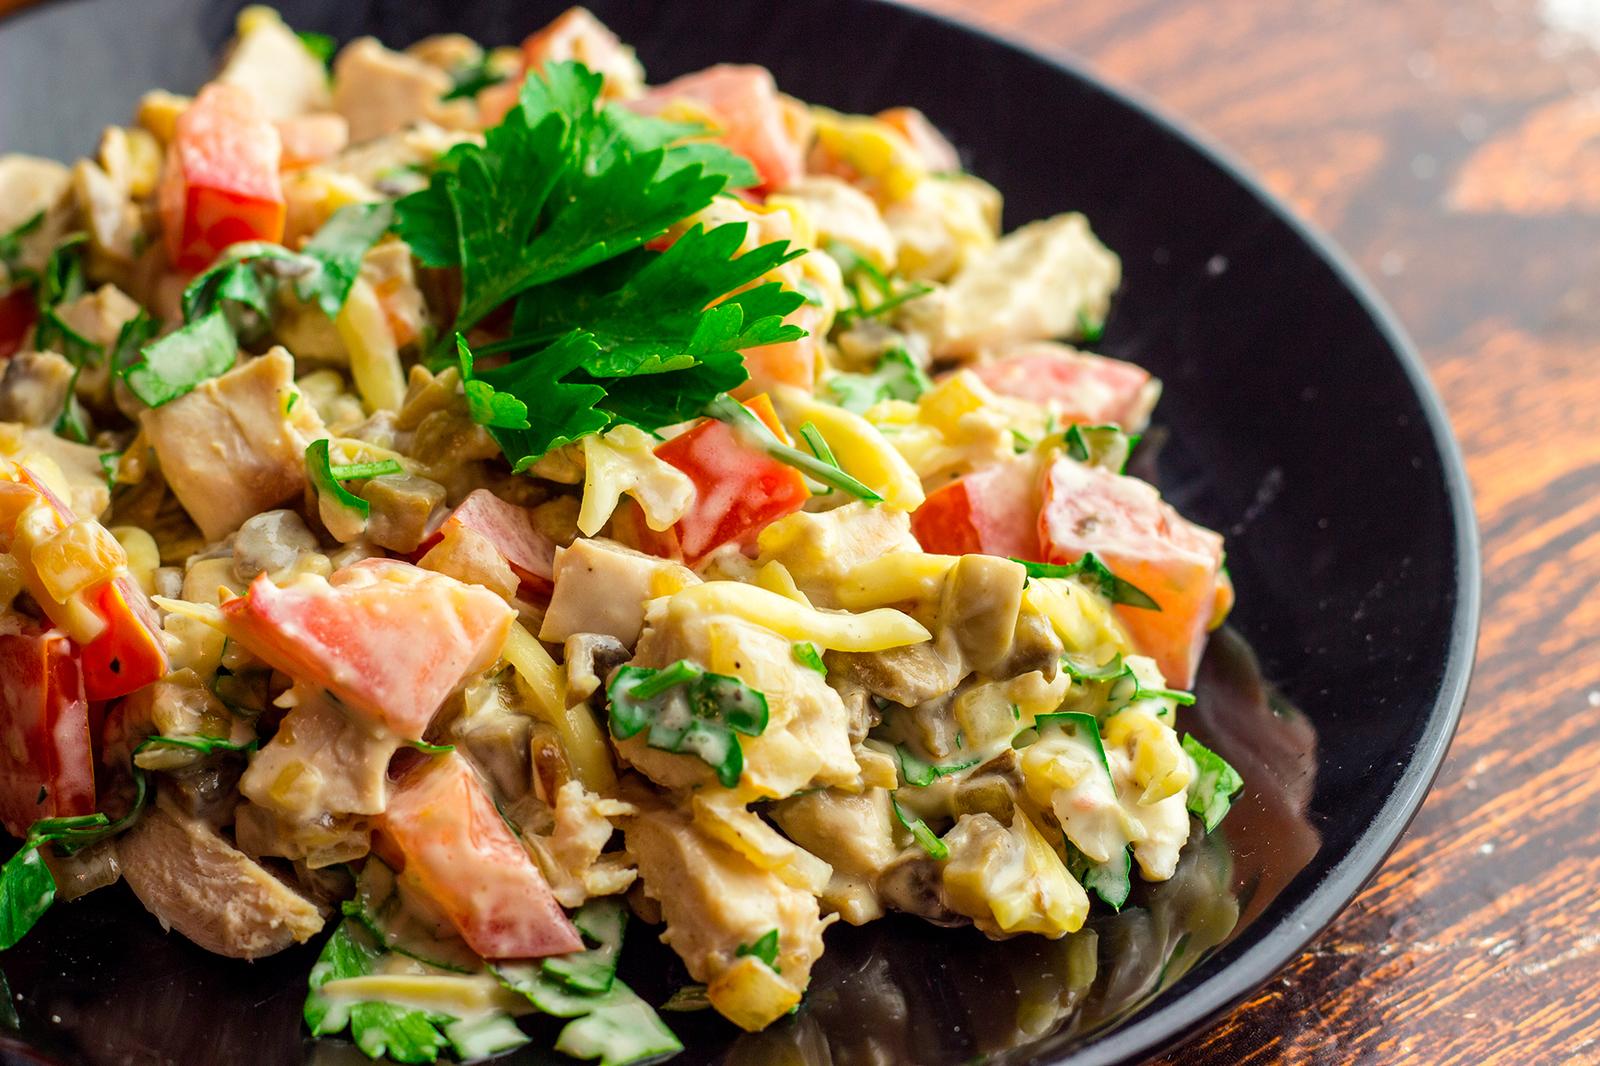 салат гусарский с курицей и шампиньонами рецепт с фото